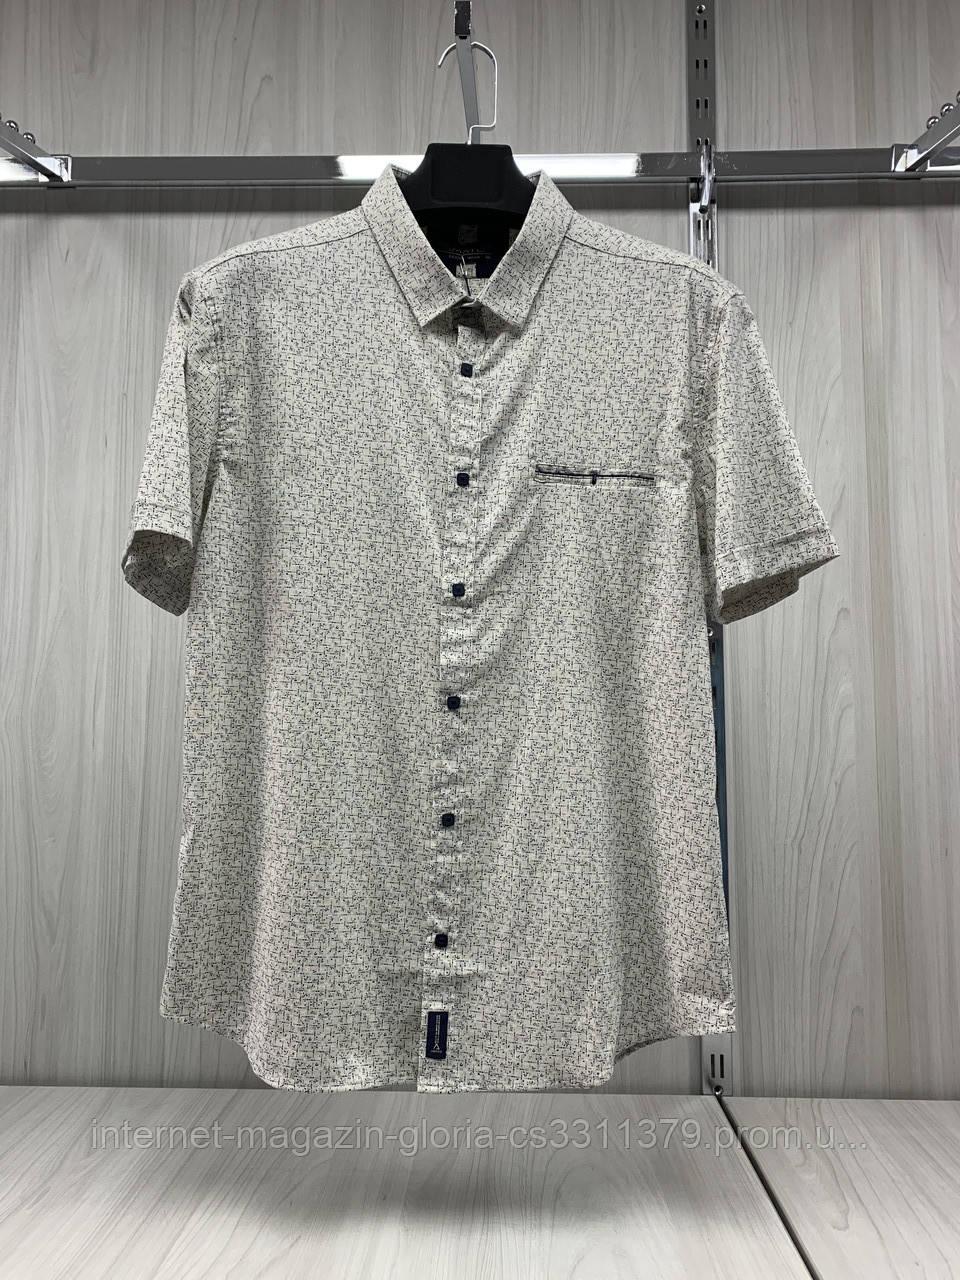 Мужская рубашка Amato. AG.KG19695-v03. Размеры: L,XL,XXL.